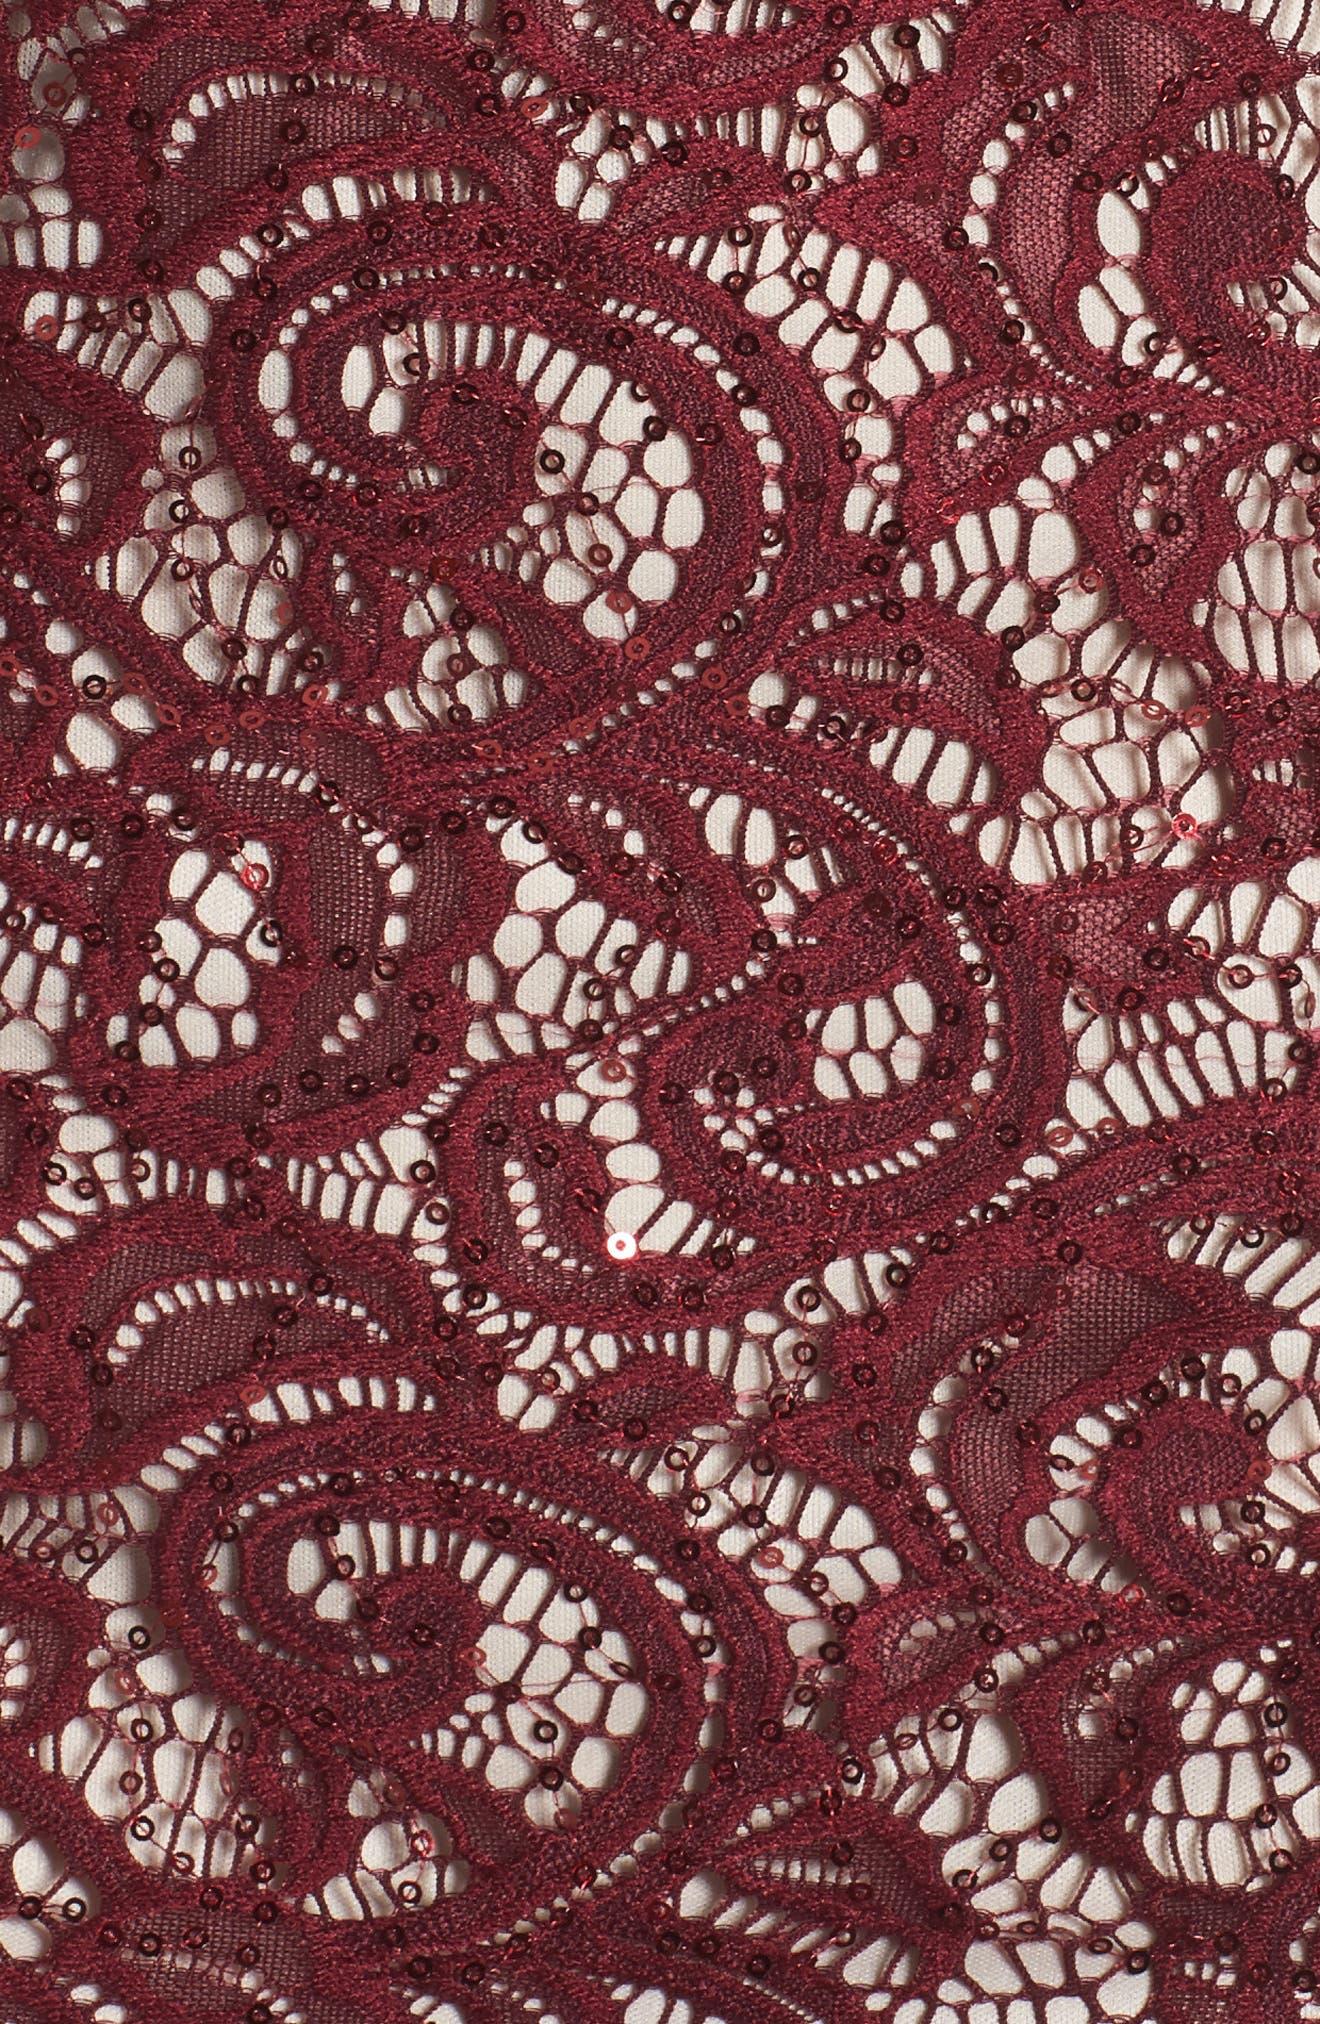 Sequin Lace Body-Con Dress,                             Alternate thumbnail 5, color,                             502